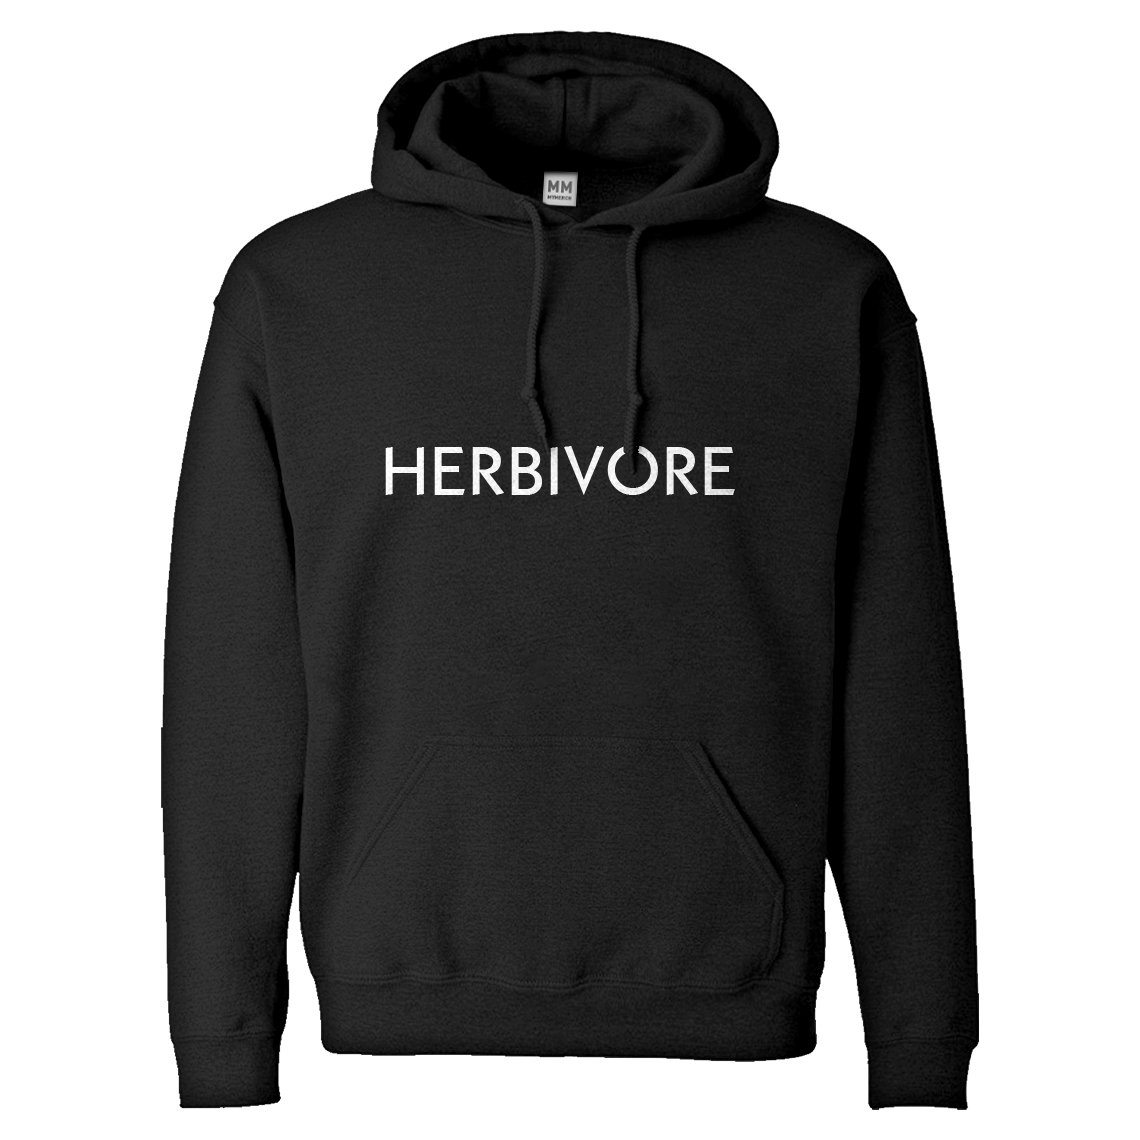 Indica Plateau Herbivore Vegan Unisex Adult Hoodie